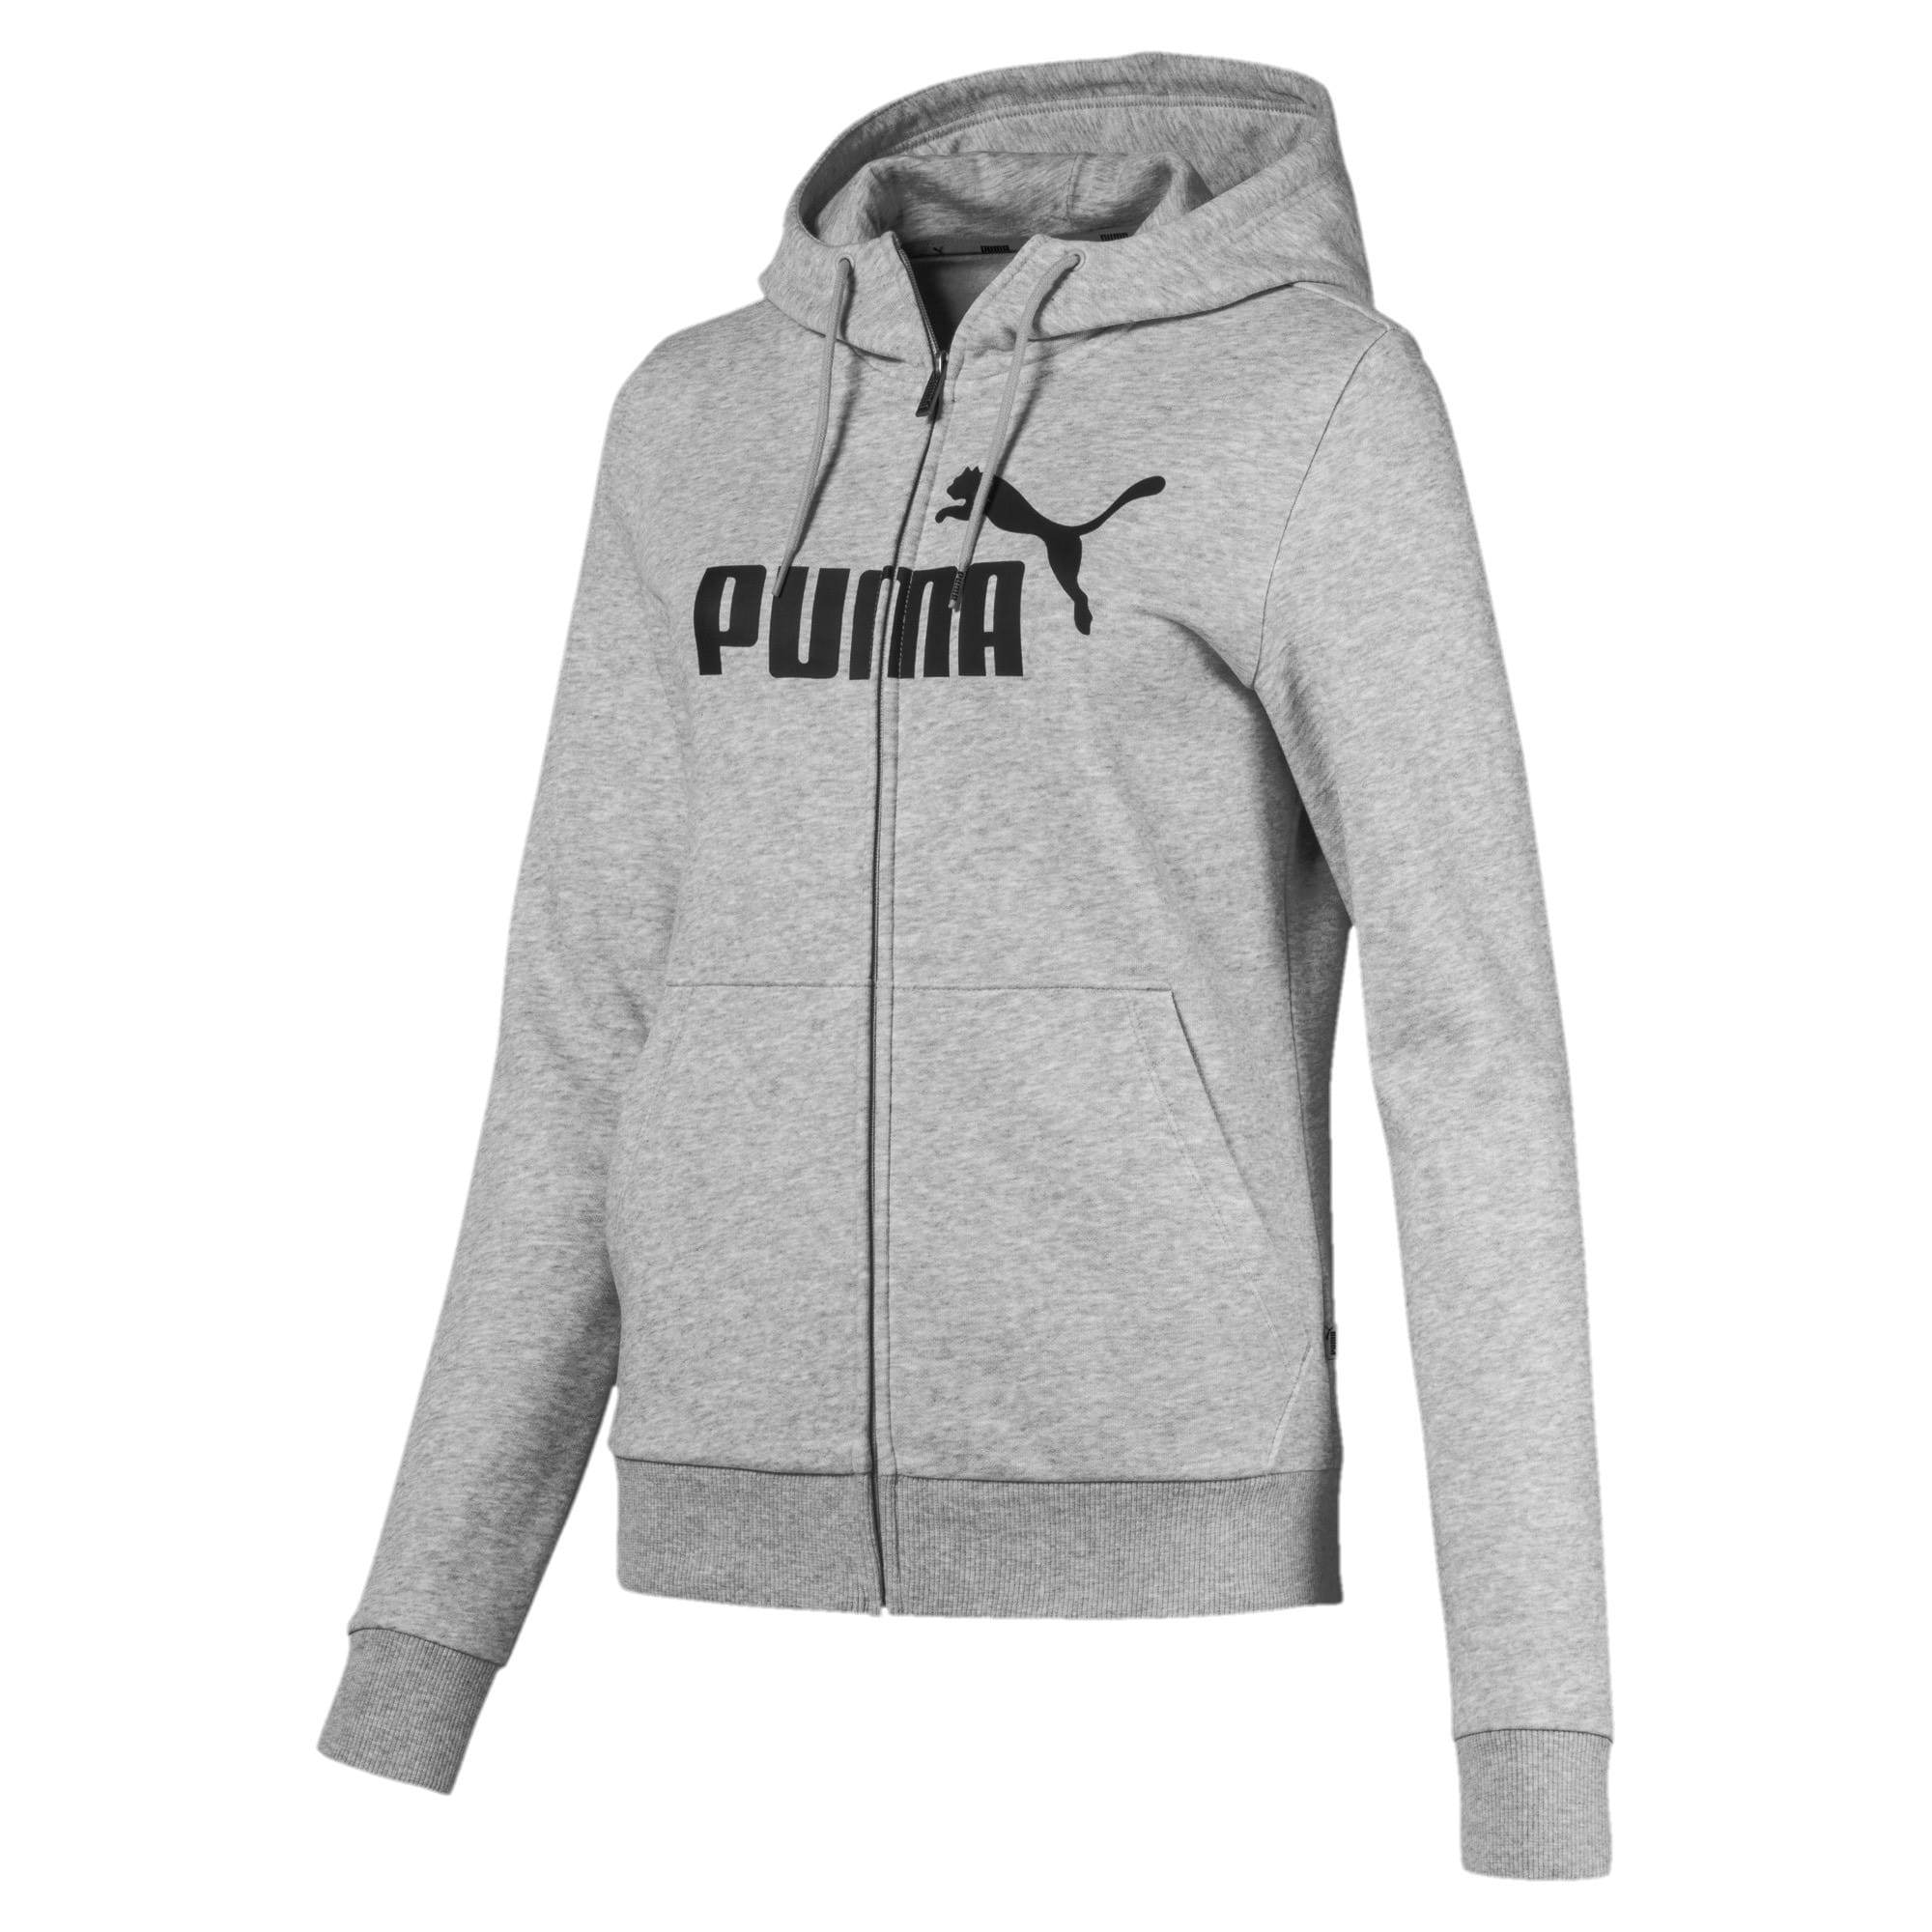 Thumbnail 1 of Essentials Fleece Hooded Full Zip Women's Sweat Jacket, Light Gray Heather, medium